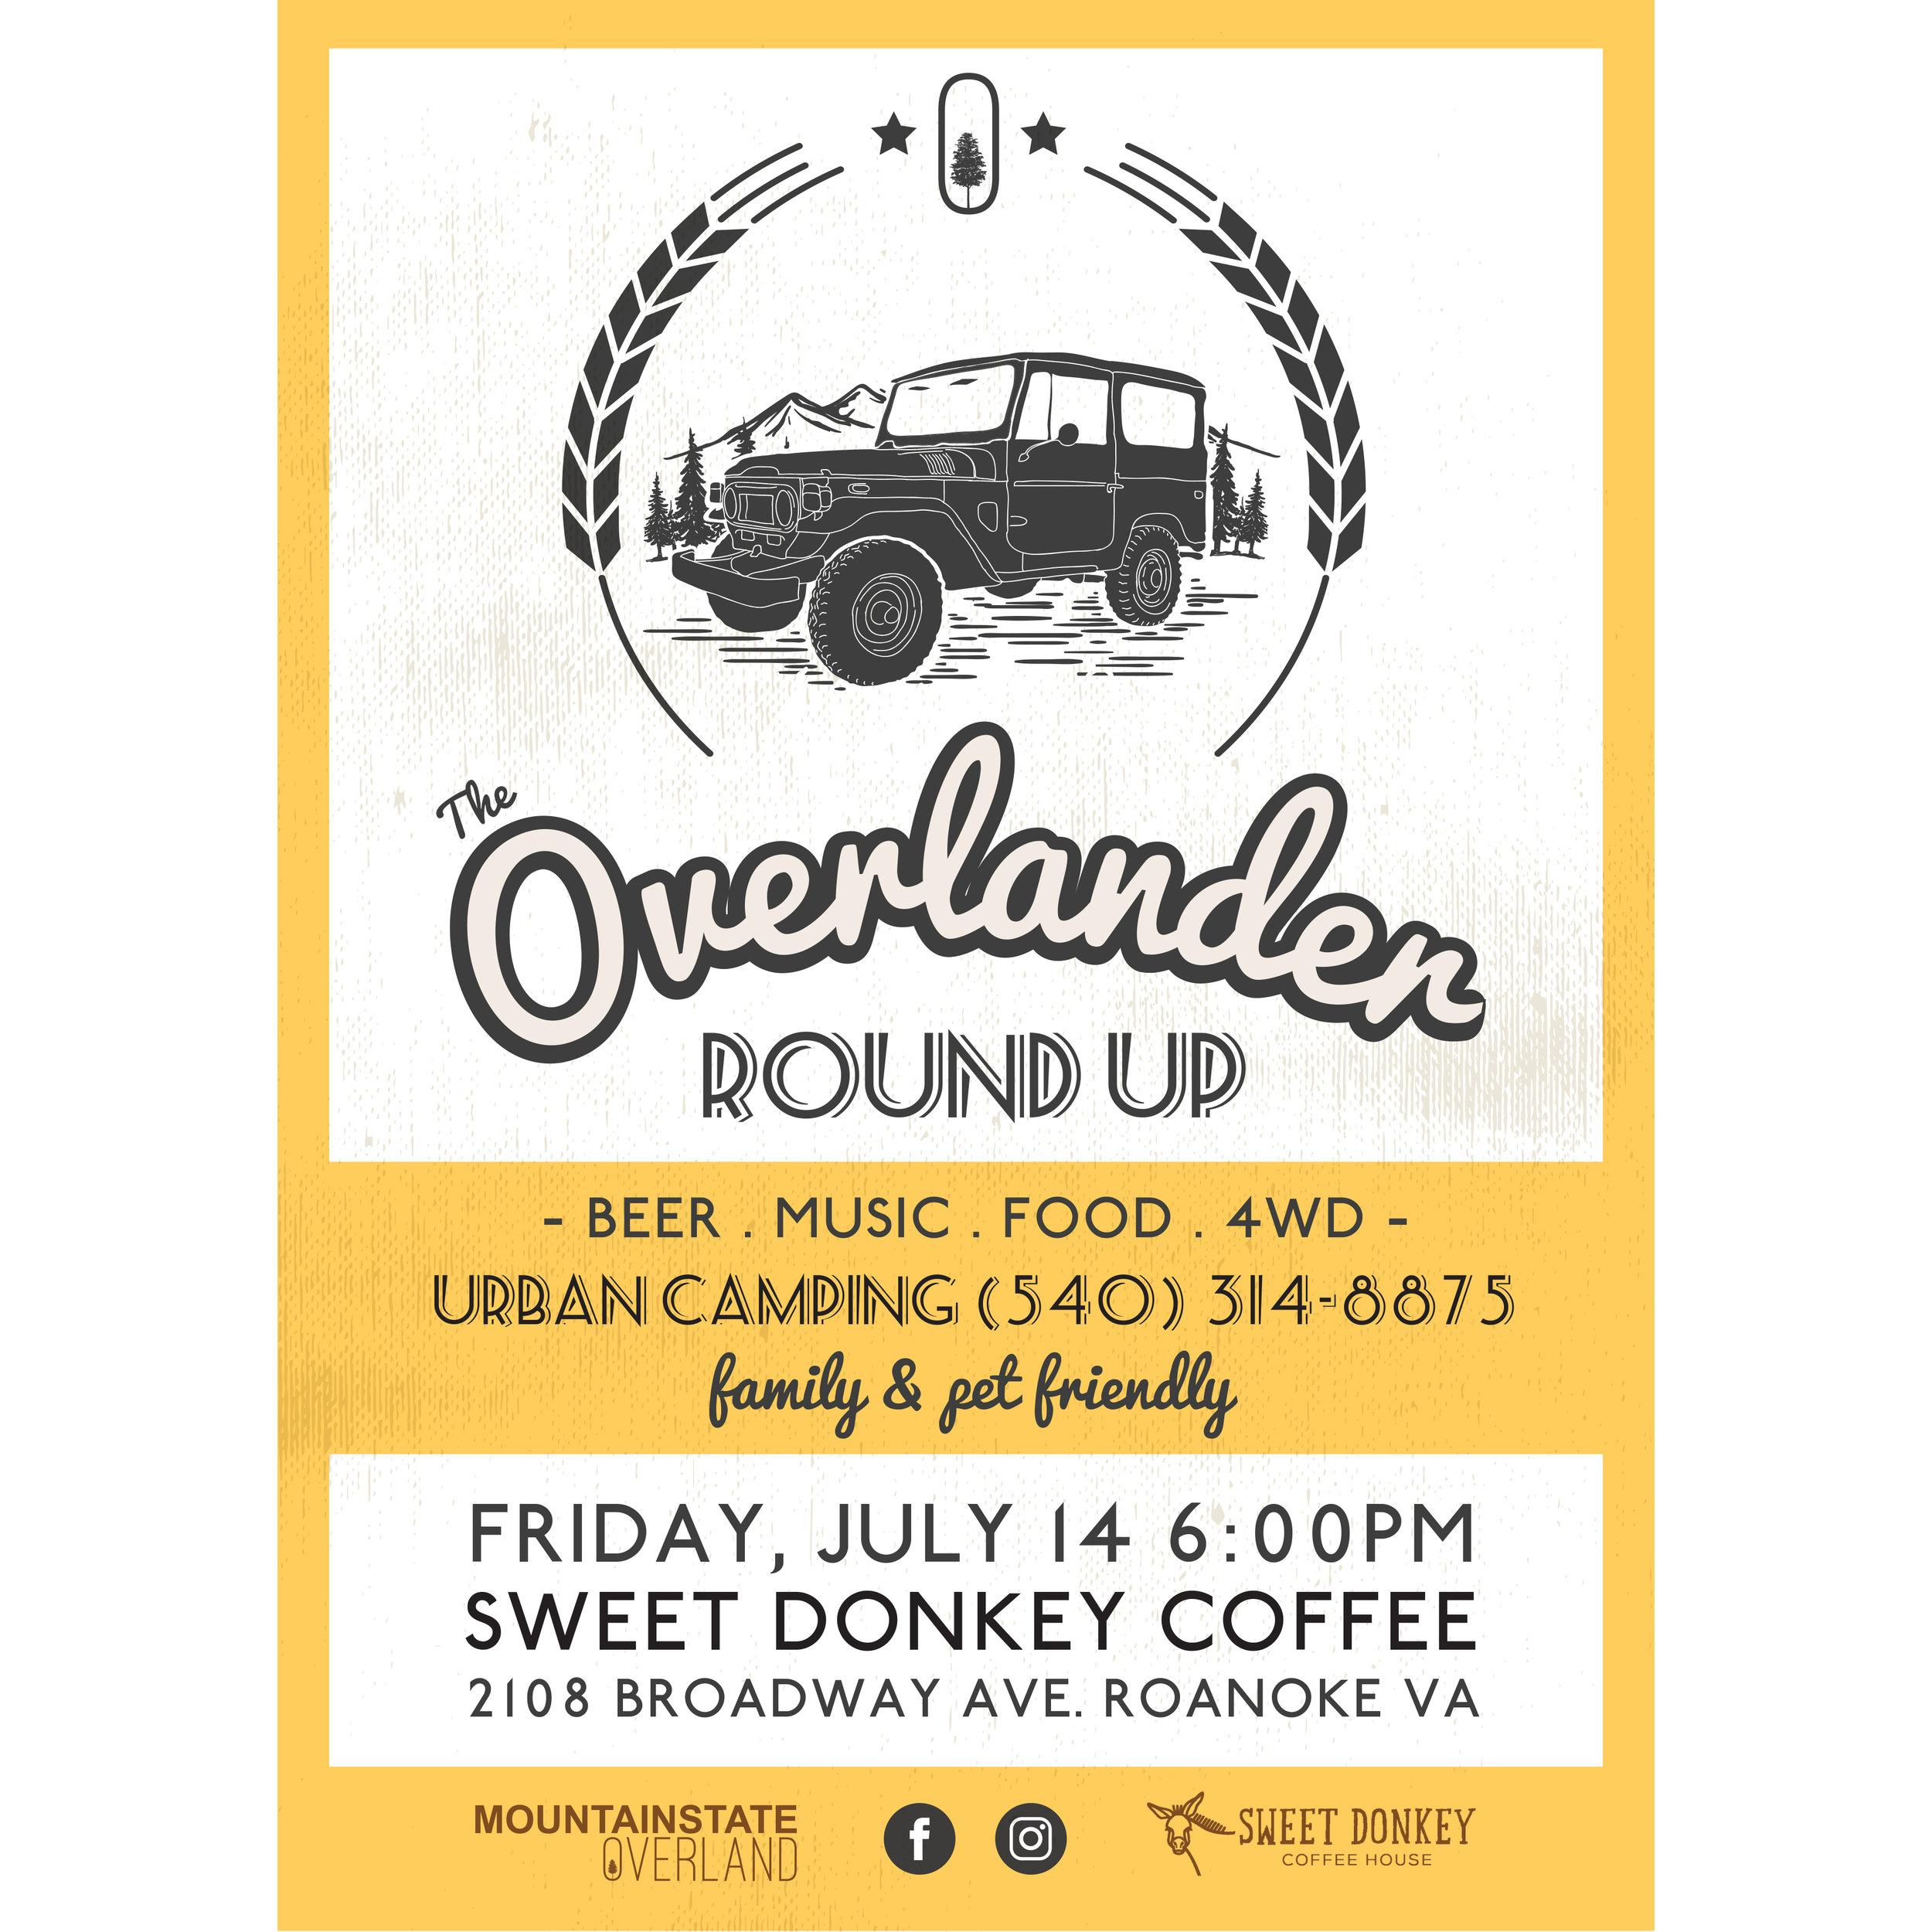 OverlandRoundup.jpg